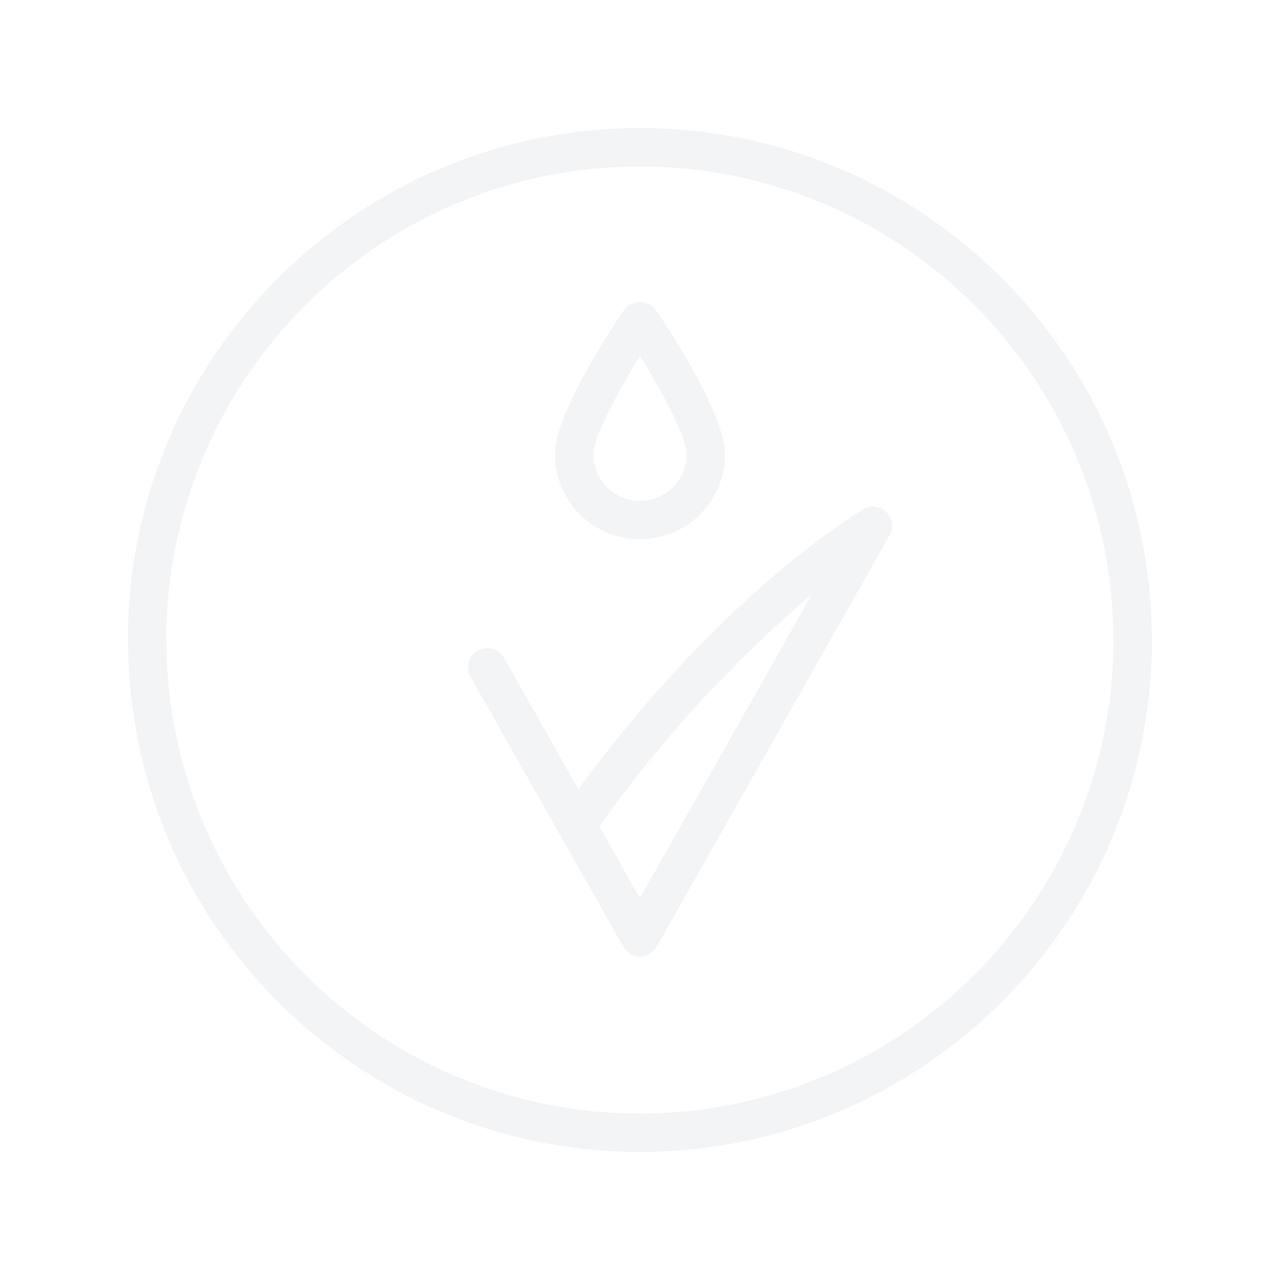 BOURJOIS Delice De Poudre Bronzing Powder No.52 Mates 16.5g